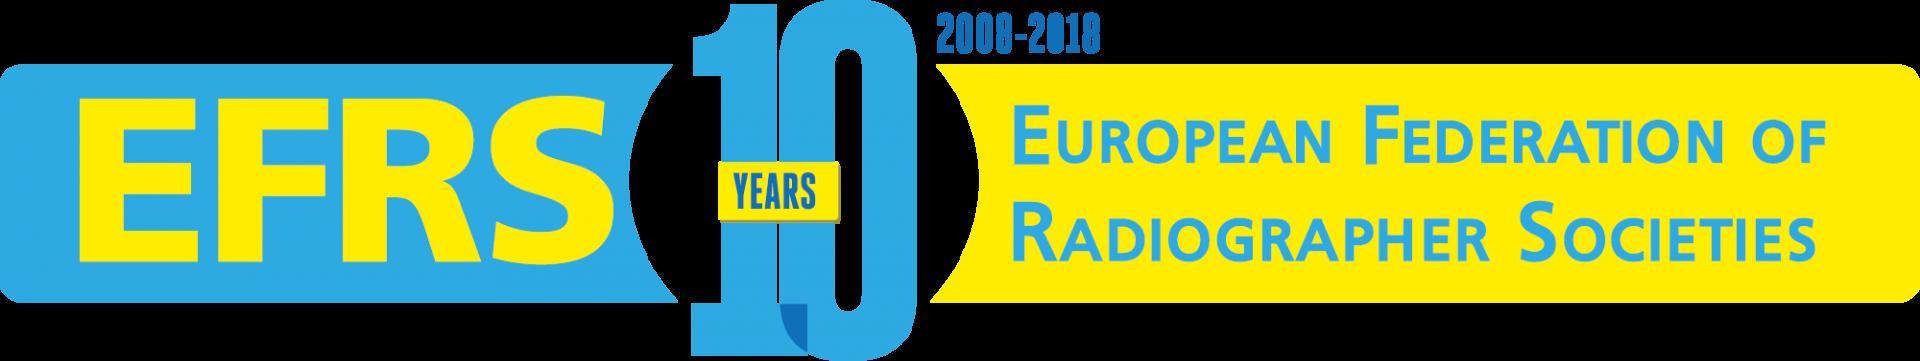 Efrs logo celebration